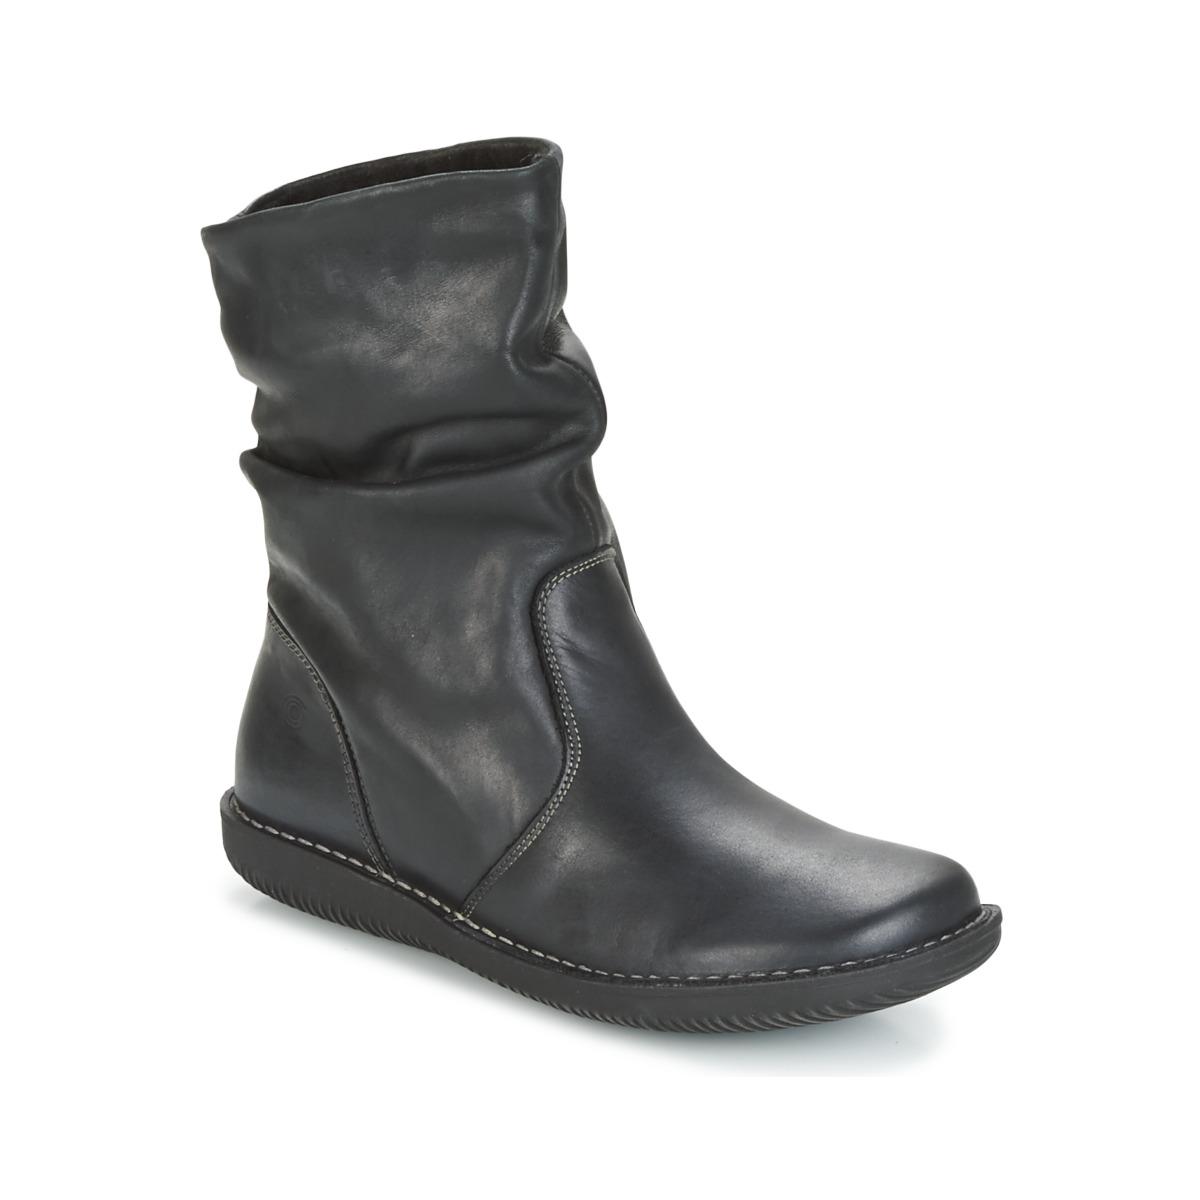 Casual Attitude HAPANO Schwarz - Kostenloser Versand bei Spartoode ! - Schuhe Boots Damen 94,99 €